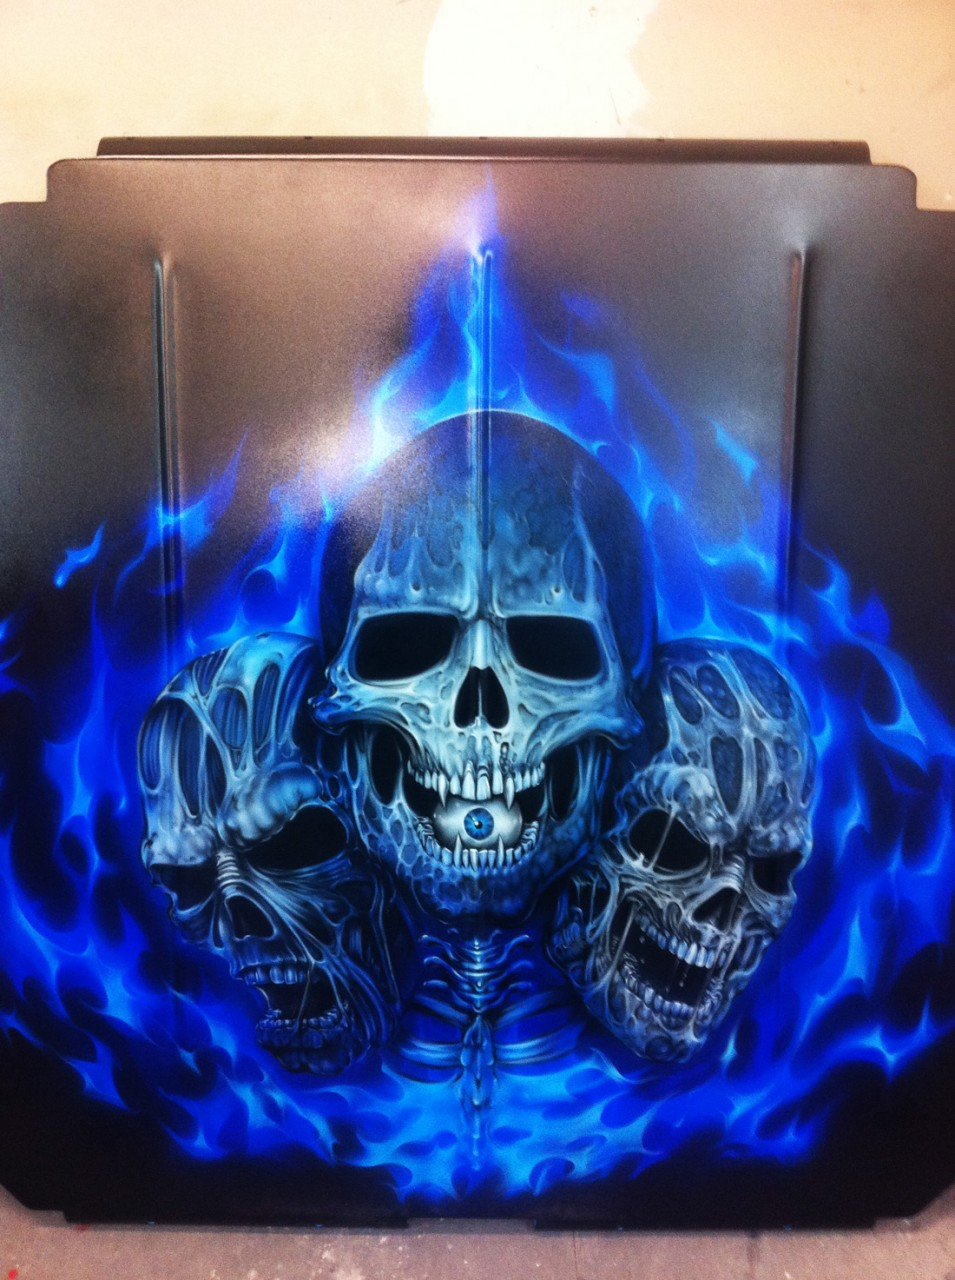 Custom Painted Sandrail Airbrushed Grim Reaper And Skulls